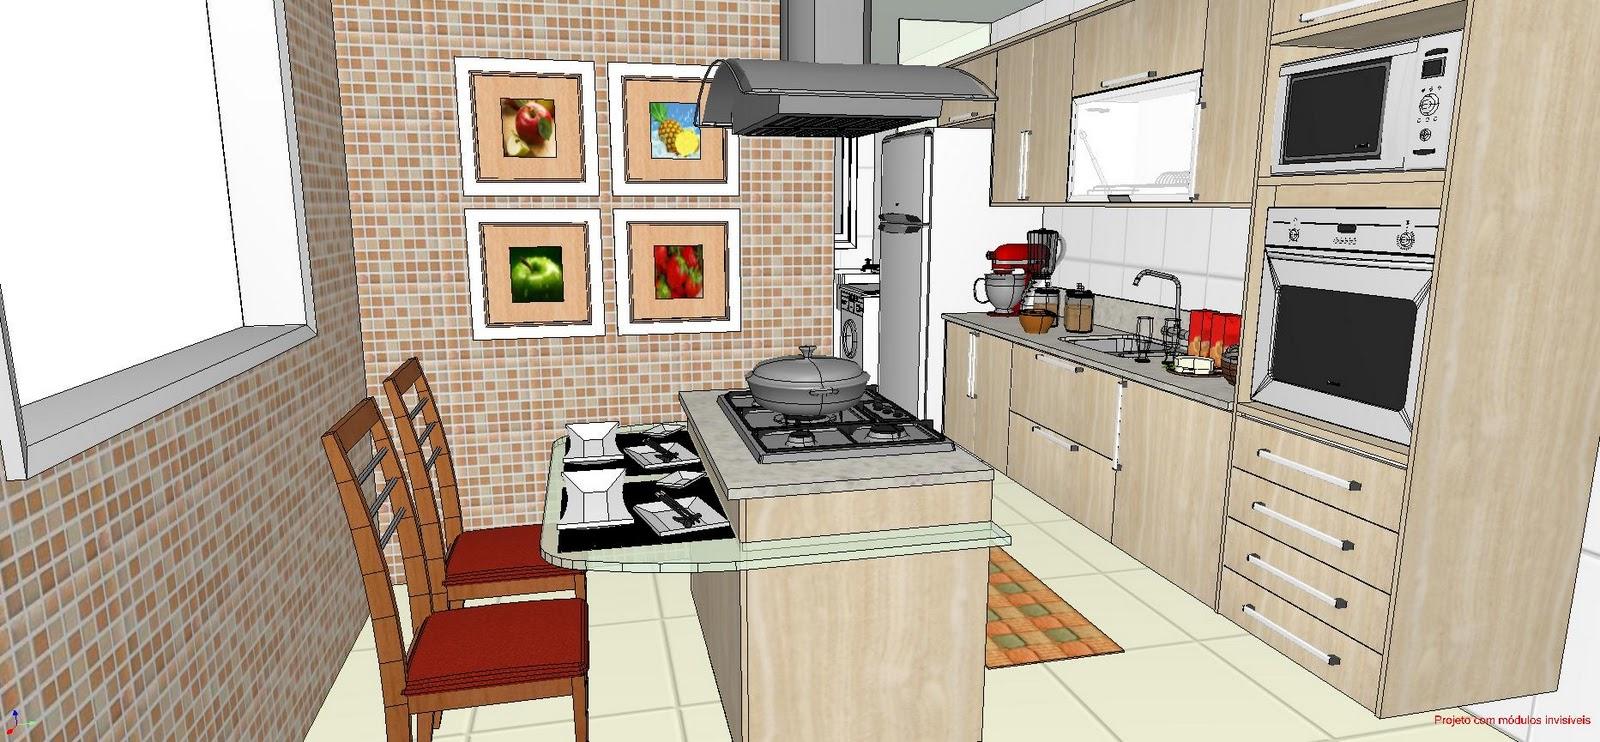 Passa Pratos Modernos Passa Pratos Modernos Cozinha Com Passa